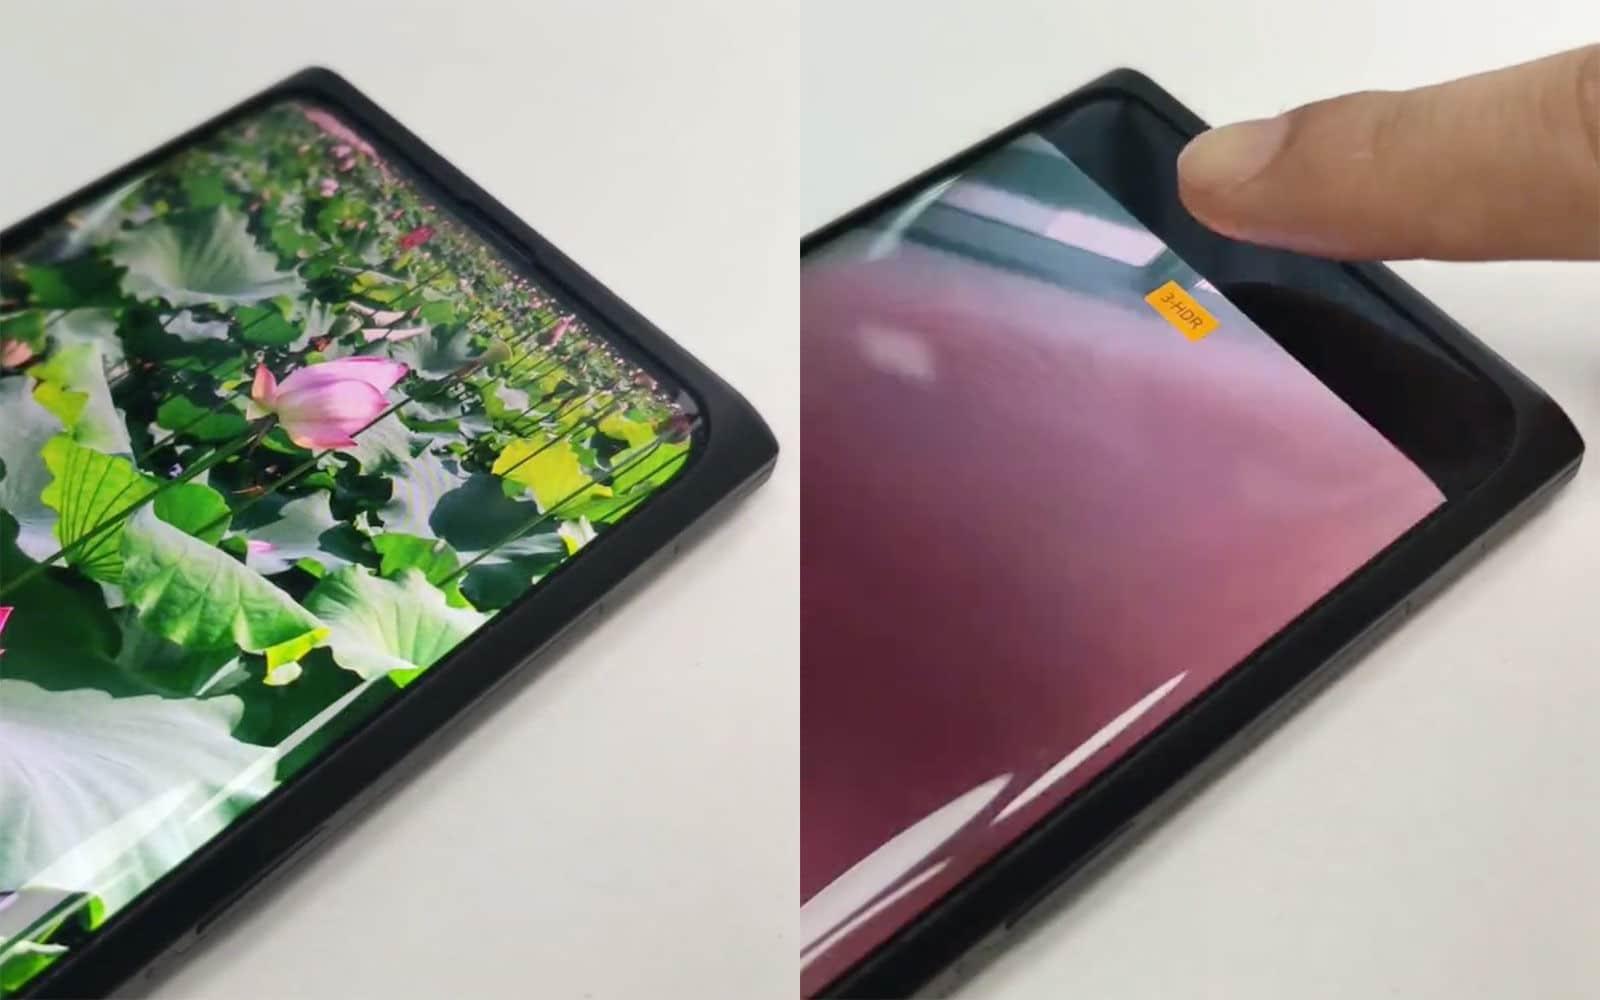 Концепт смартфона OPPO с подэкранной камерой. Фото: пресс-служба OPPO